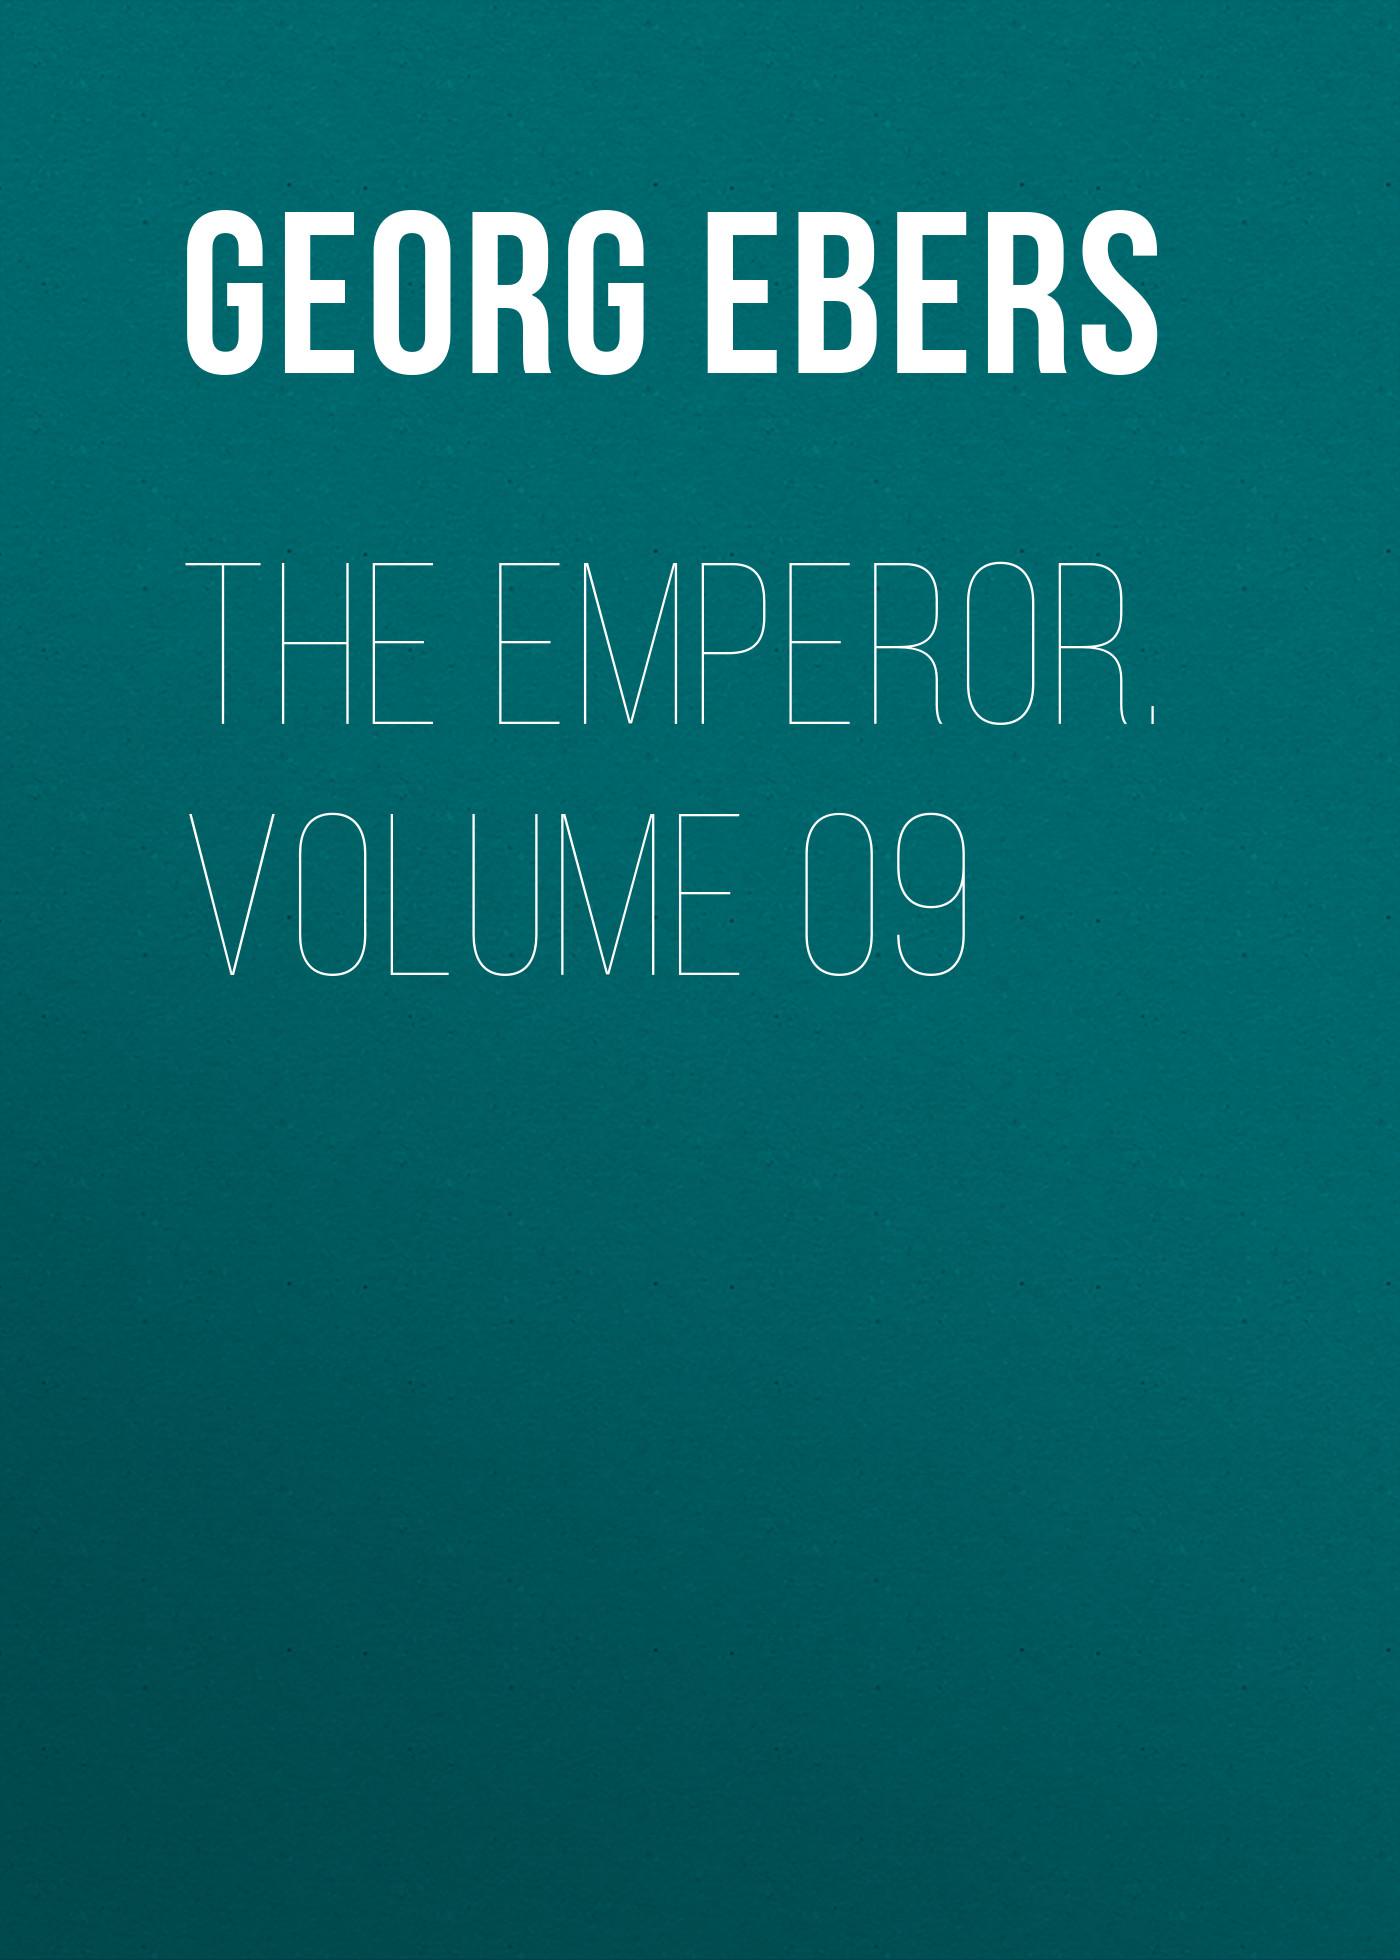 Georg Ebers The Emperor. Volume 09 georg ebers homo sum volume 02